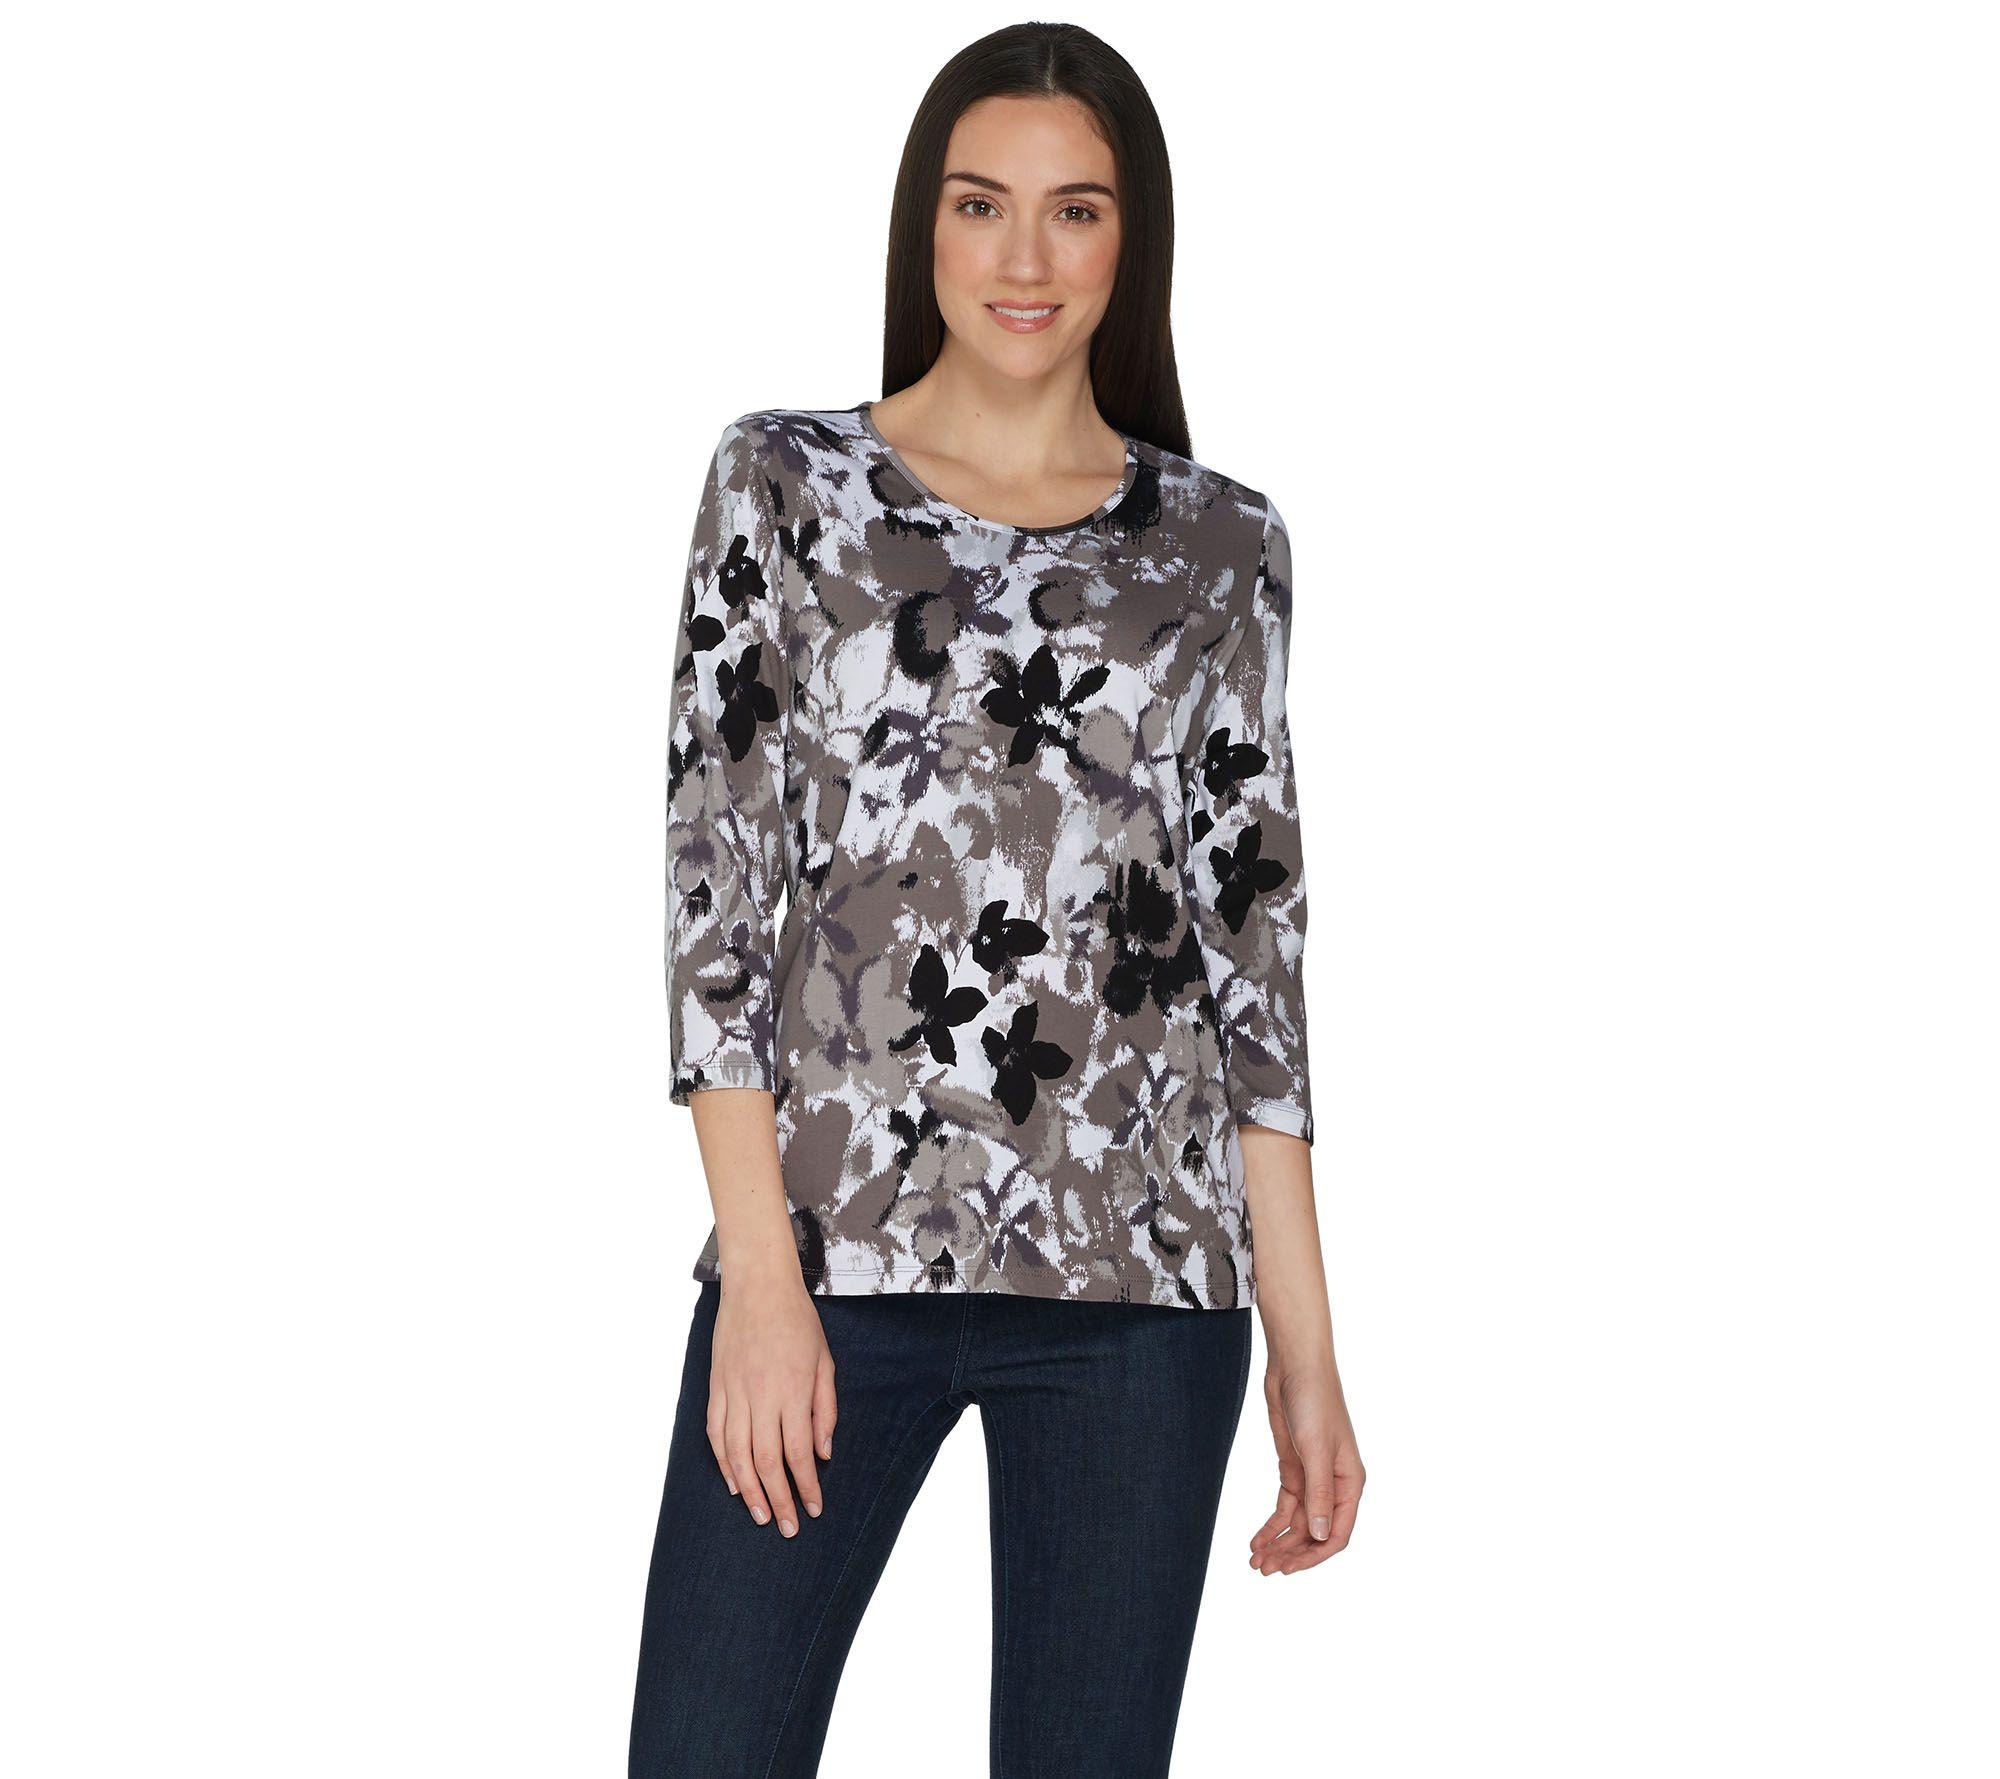 65de246339 Denim & Co. Perfect Jersey 3/4 Sleeve Watercolor Print Top - Page 1 —  QVC.com